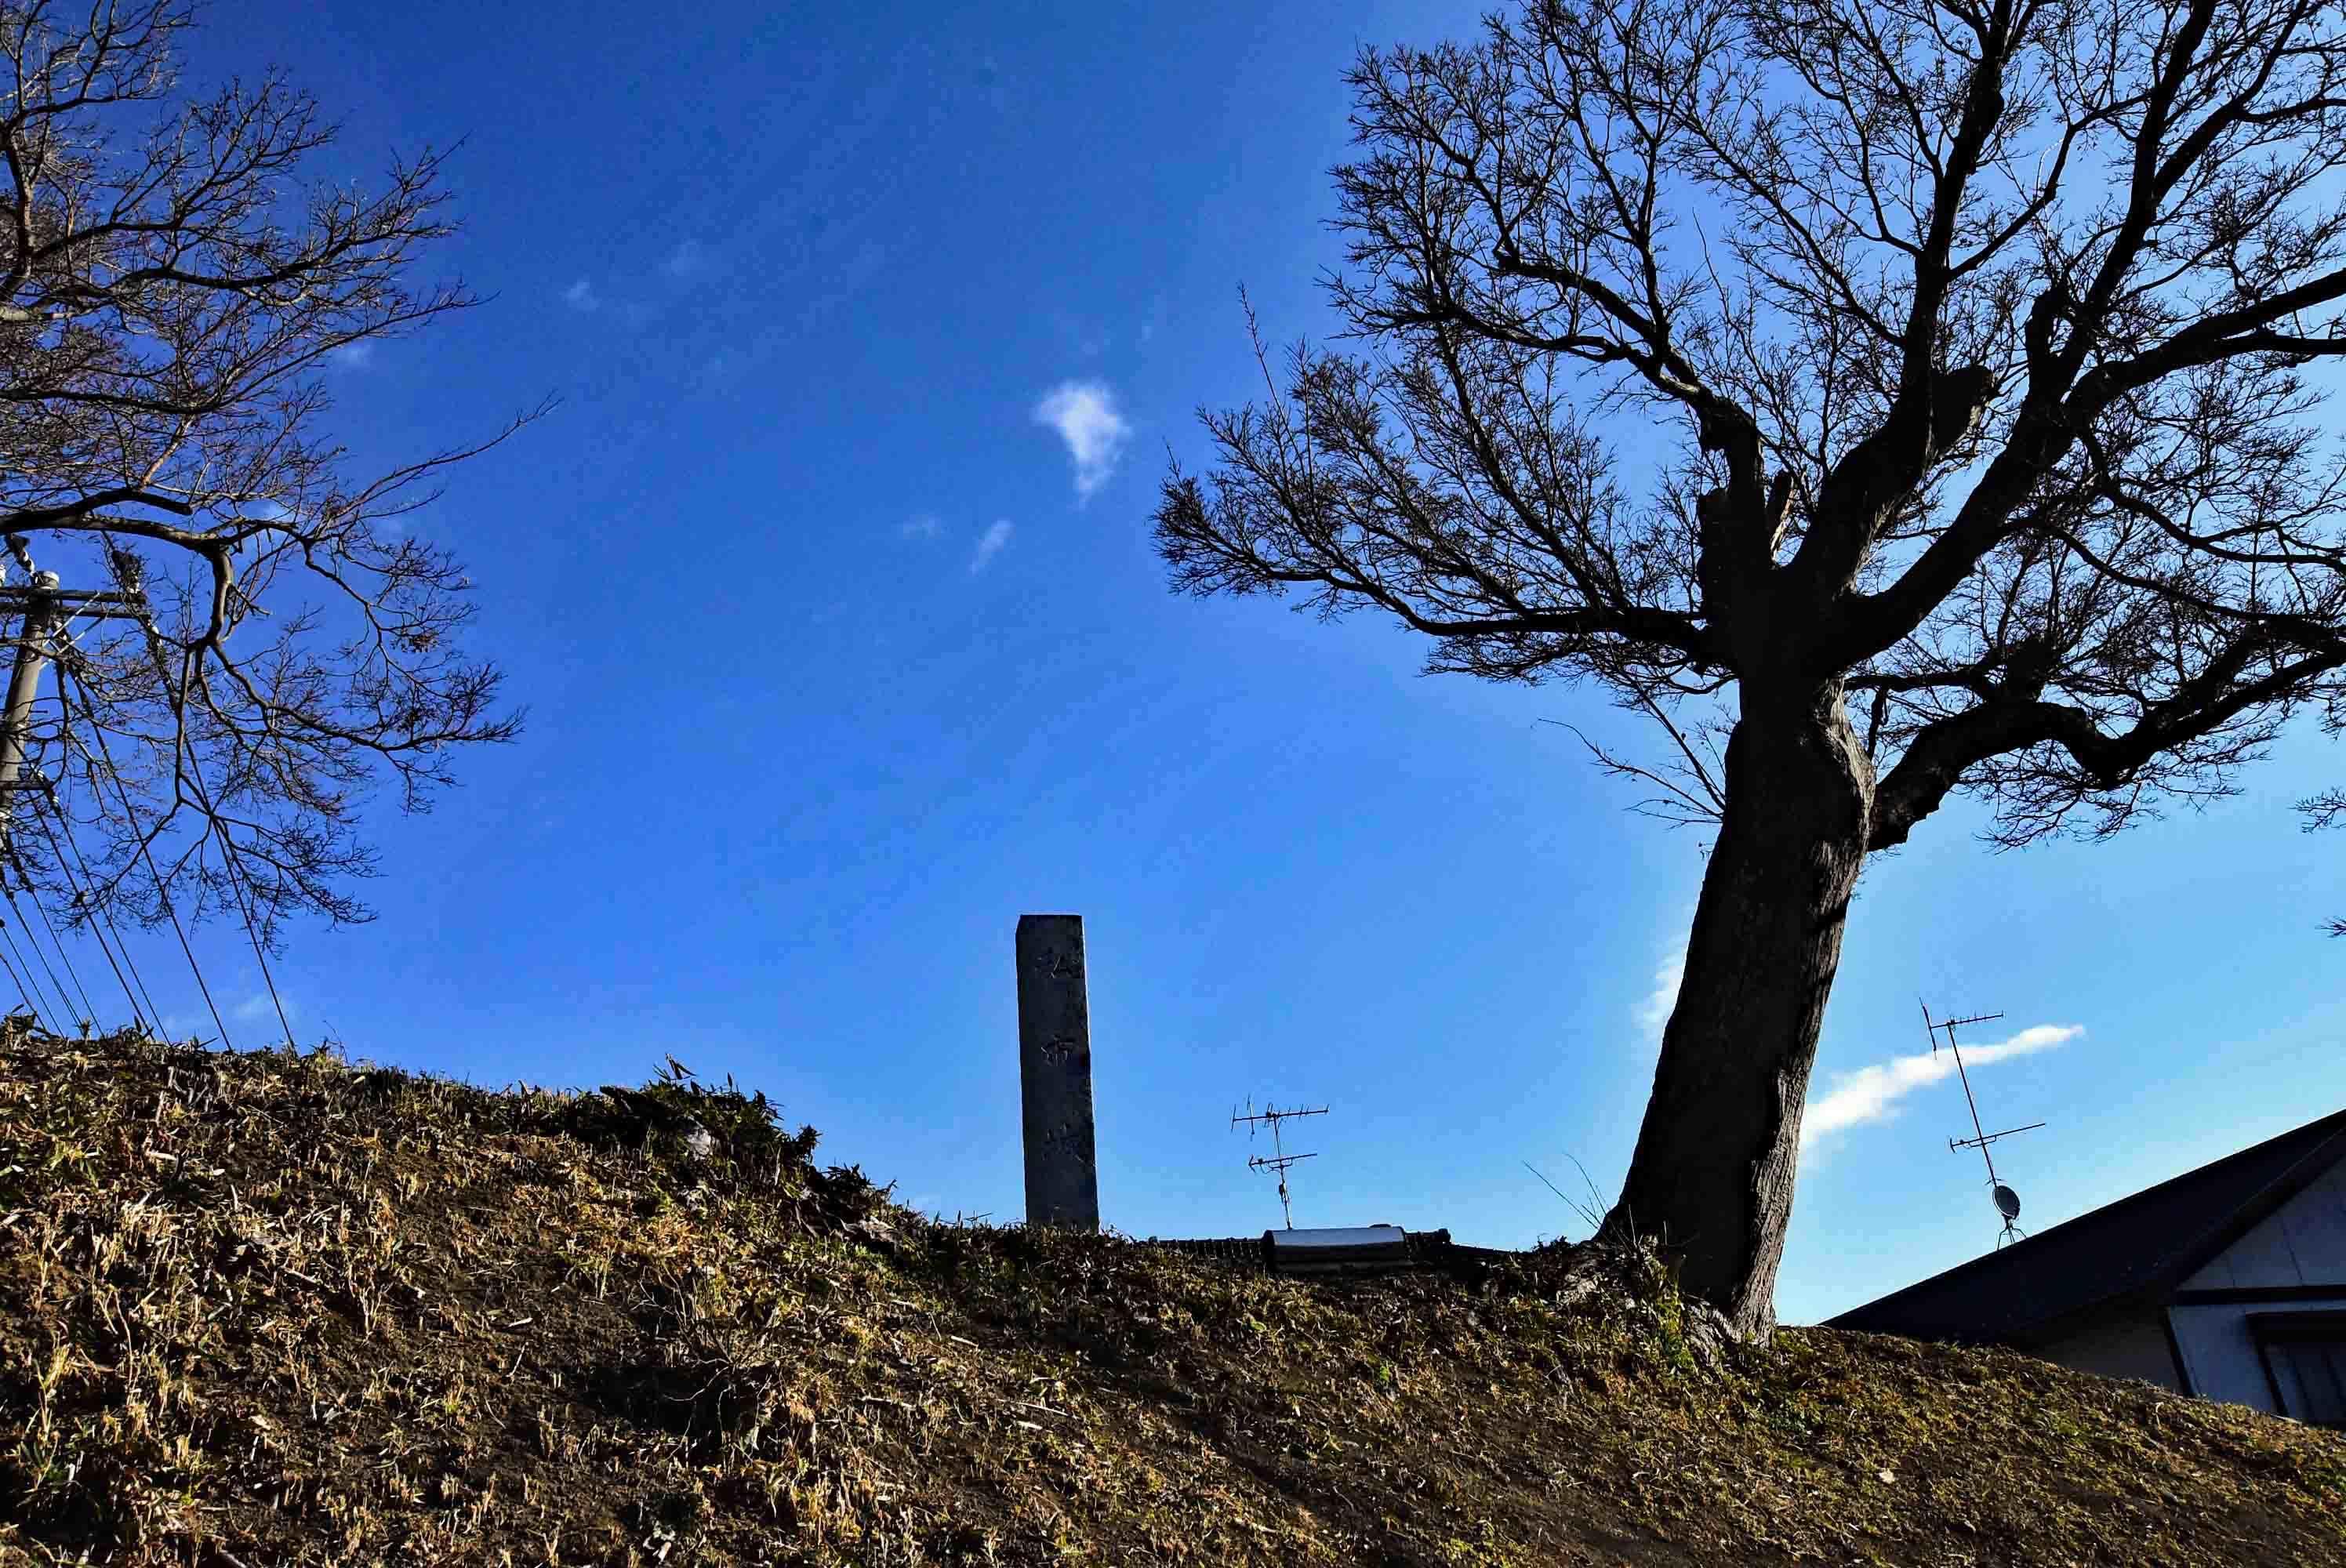 DSC_8252改 騎西城 土塁上の城址碑